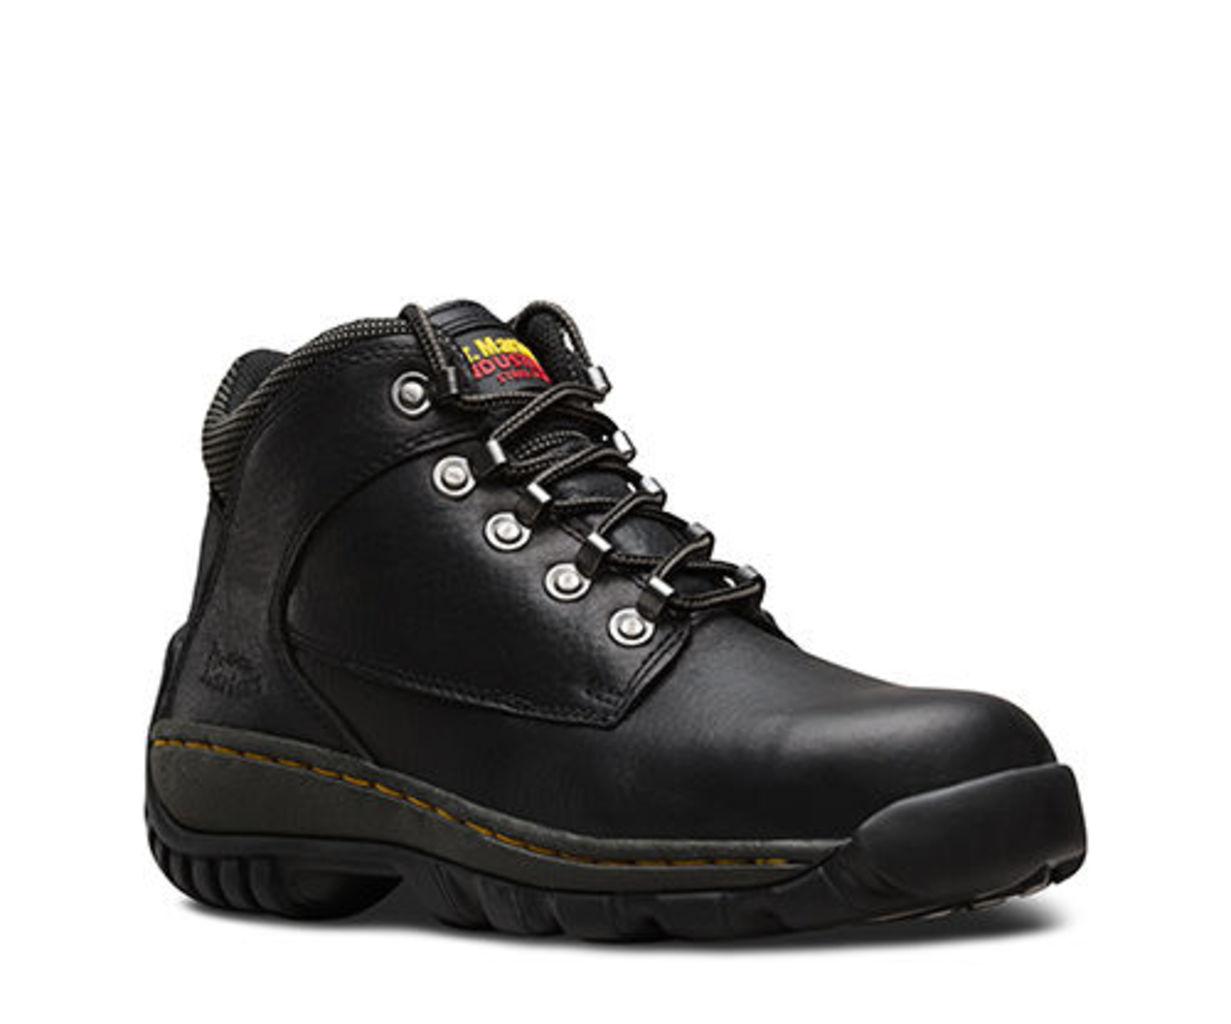 Outdoor 7a52 Boot